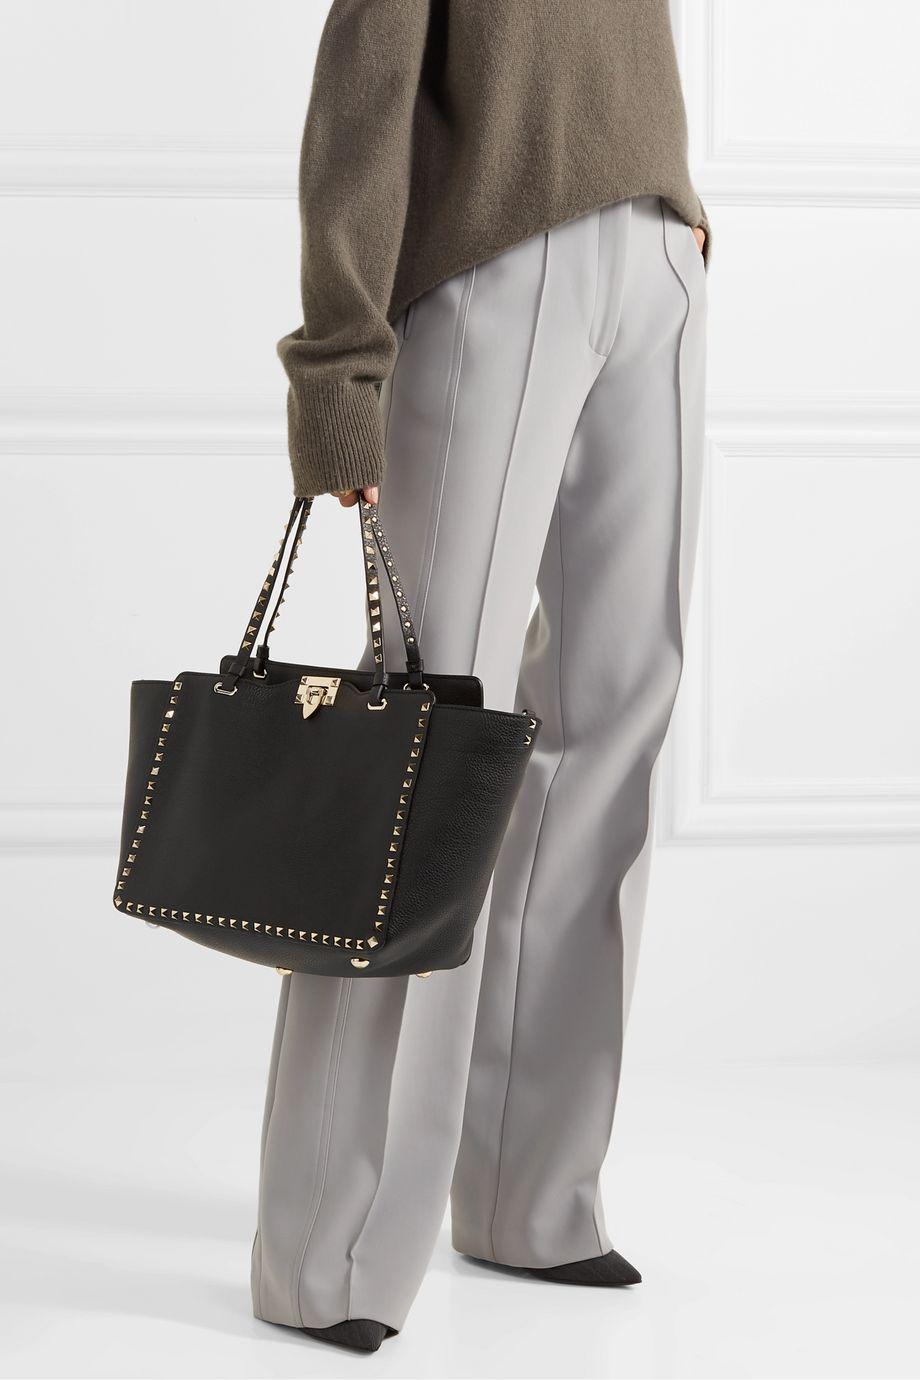 Valentino Valentino Garavani Rockstud medium textured-leather tote